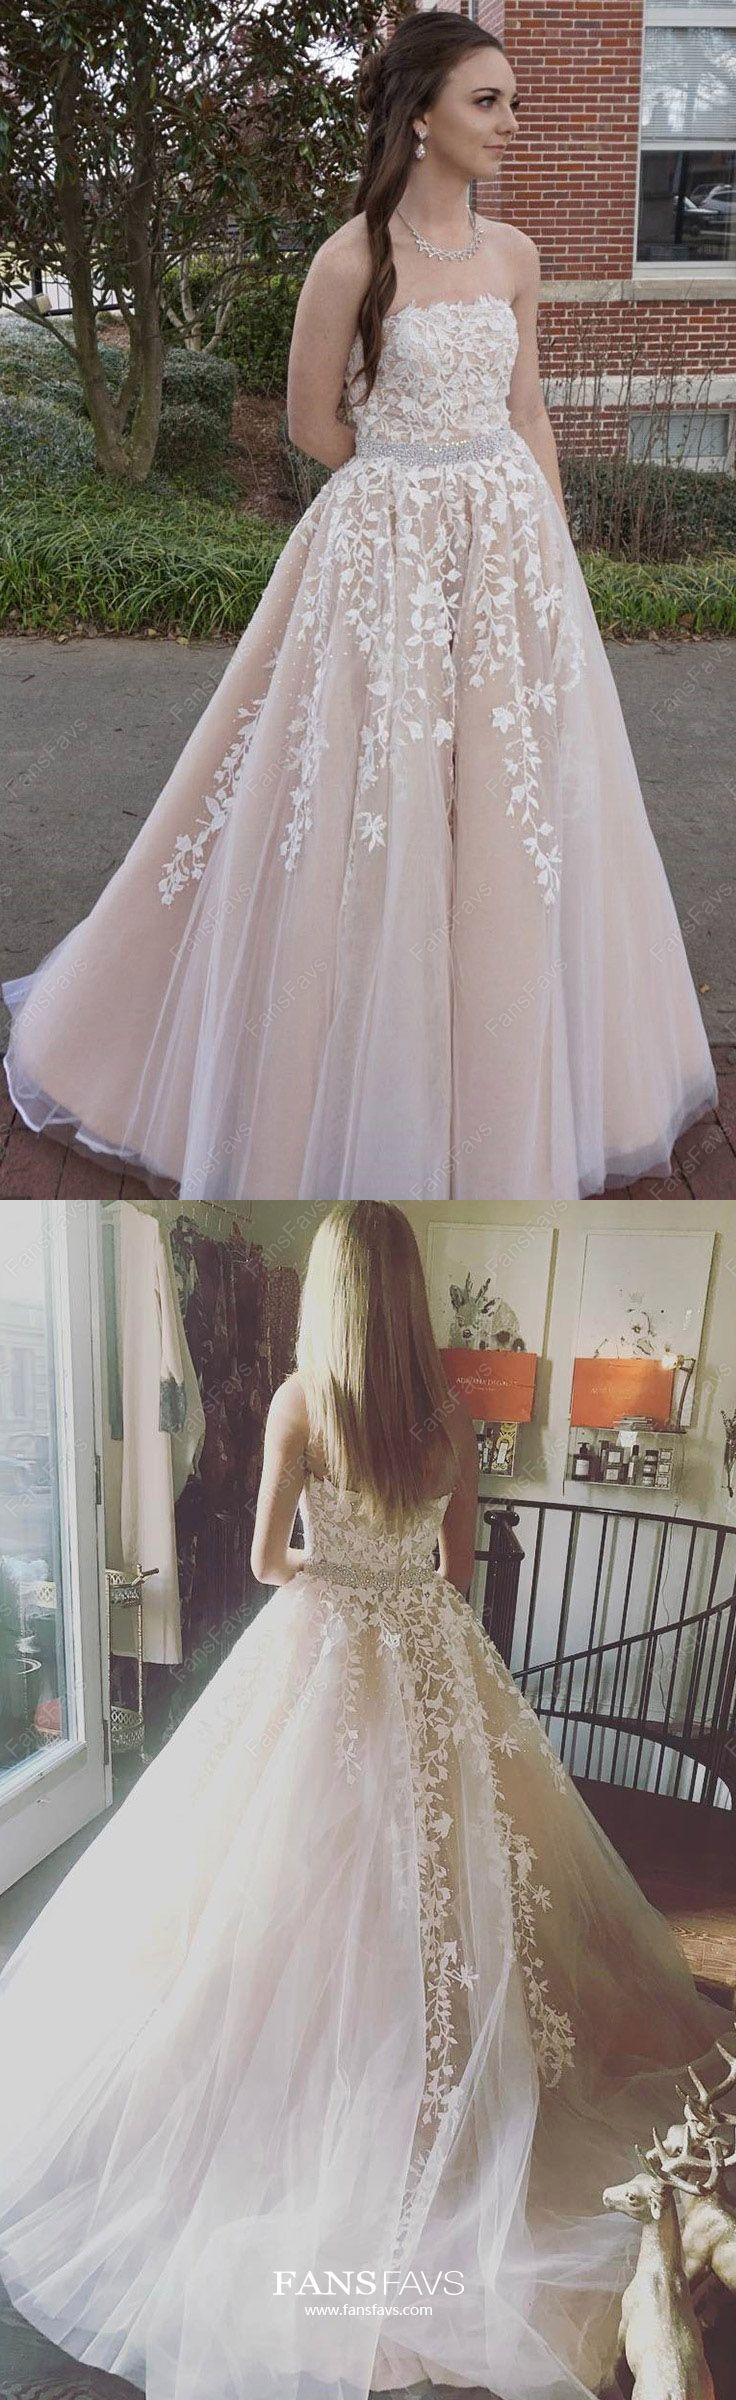 Pink prom dresses long prom dresses princess vintage prom